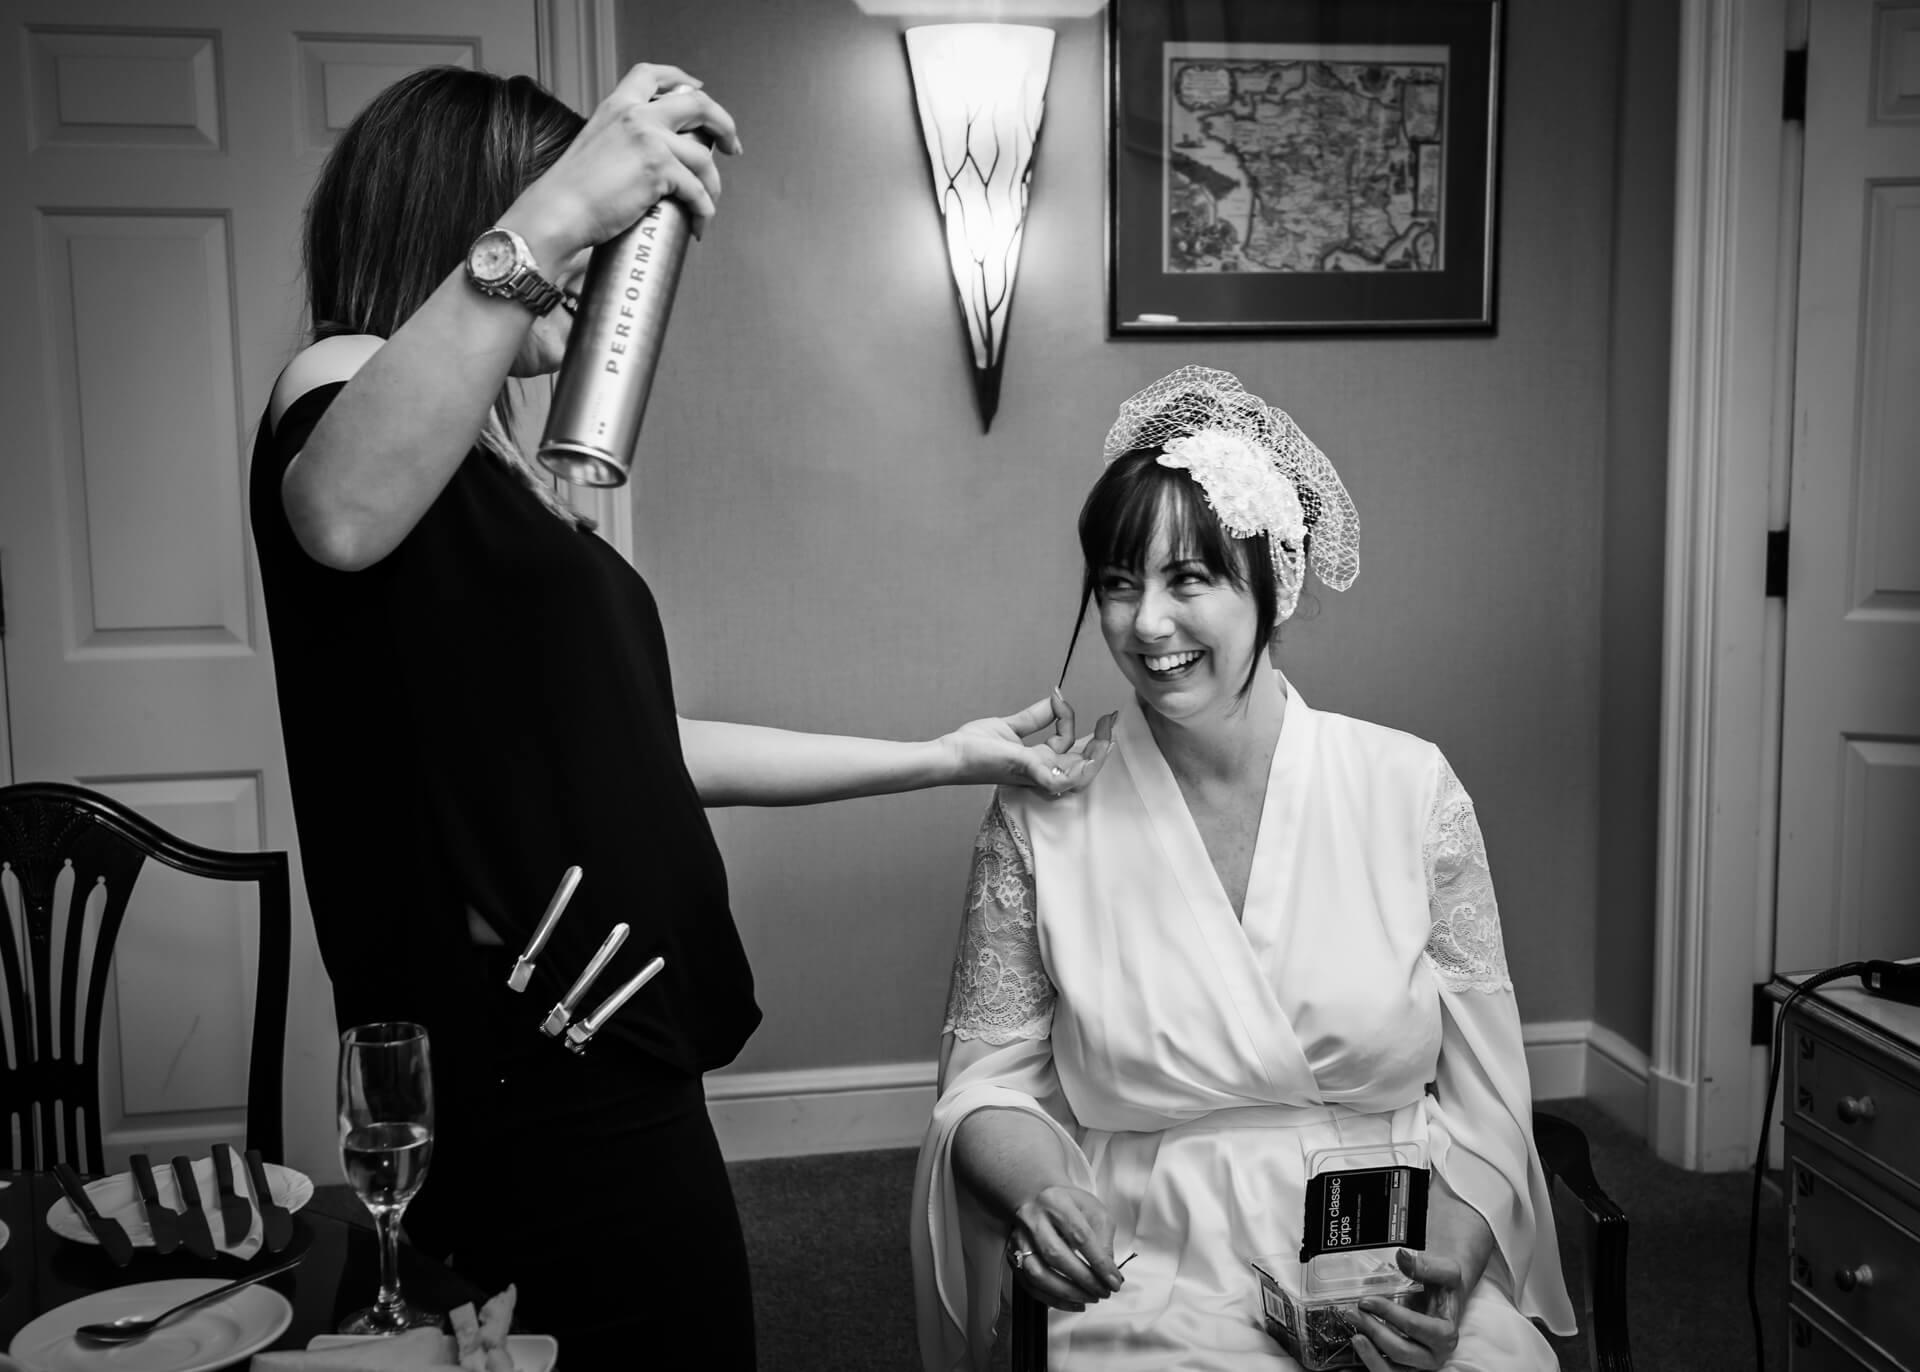 Hazlewood Castle wedding photographer - bride getting her hair done